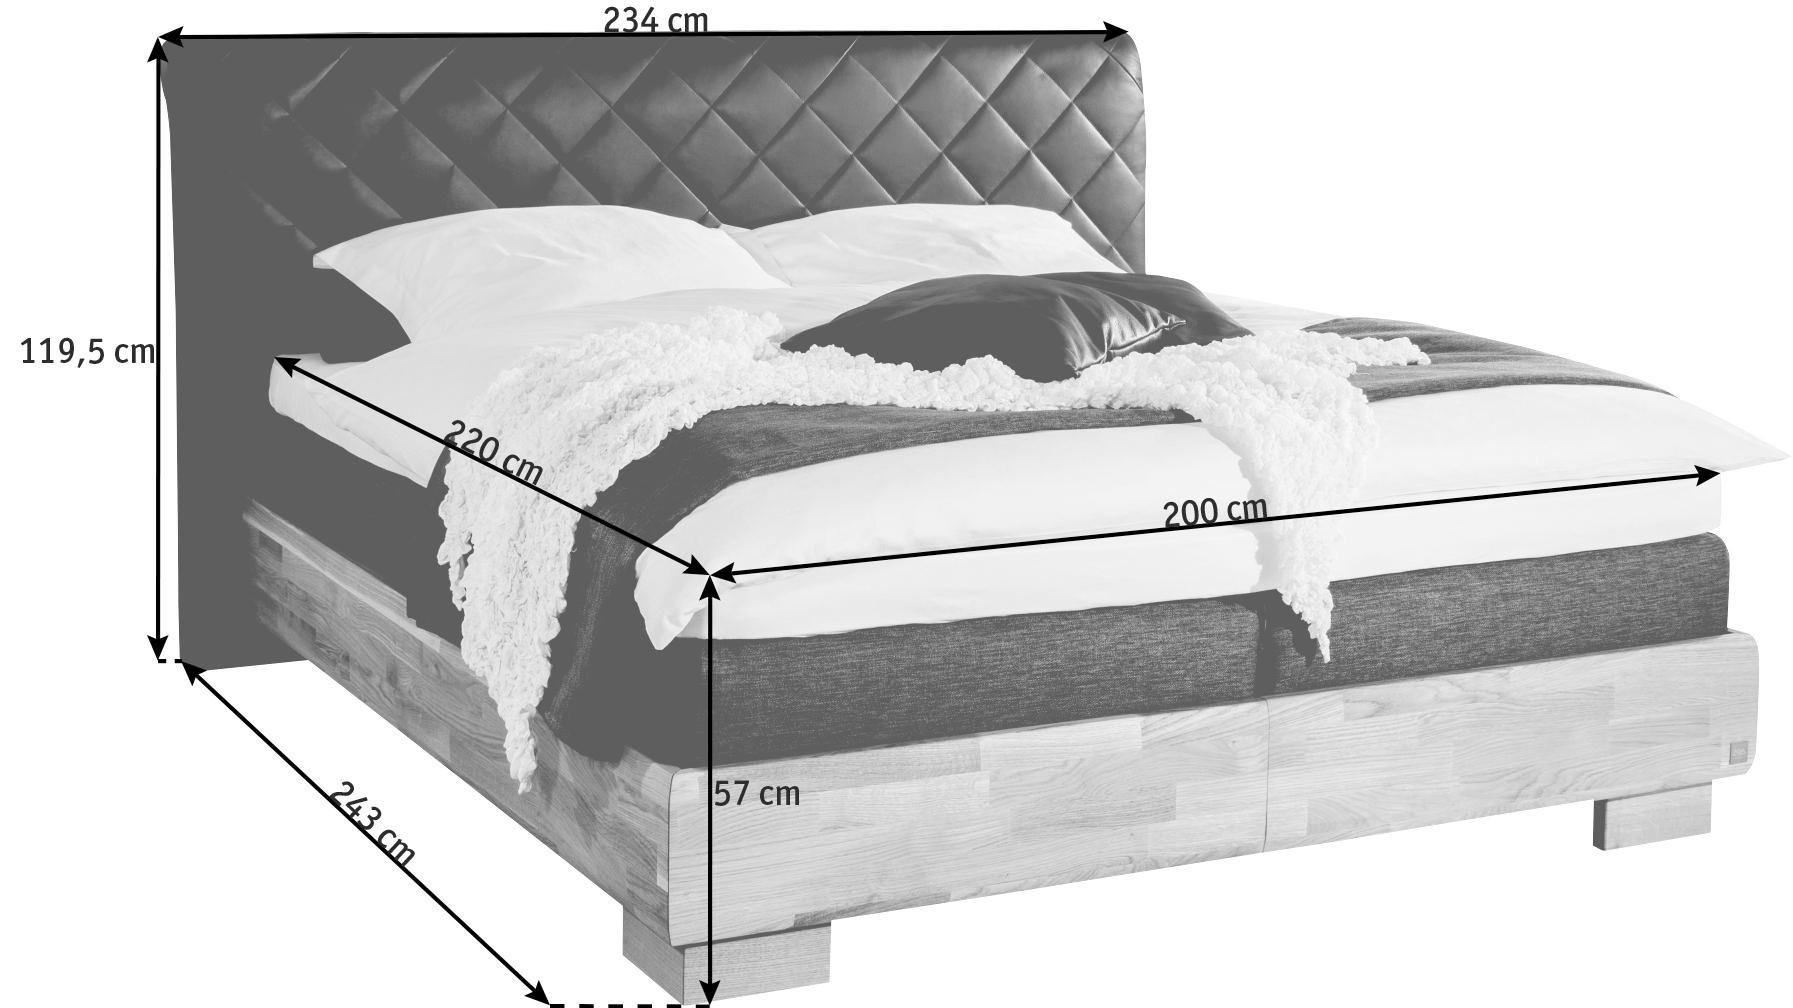 BOXSPRINGBETT 200/220 cm  INKL. Matratze, Topper - Eichefarben/Braun, KONVENTIONELL, Leder/Holz (200/220cm) - NOVEL